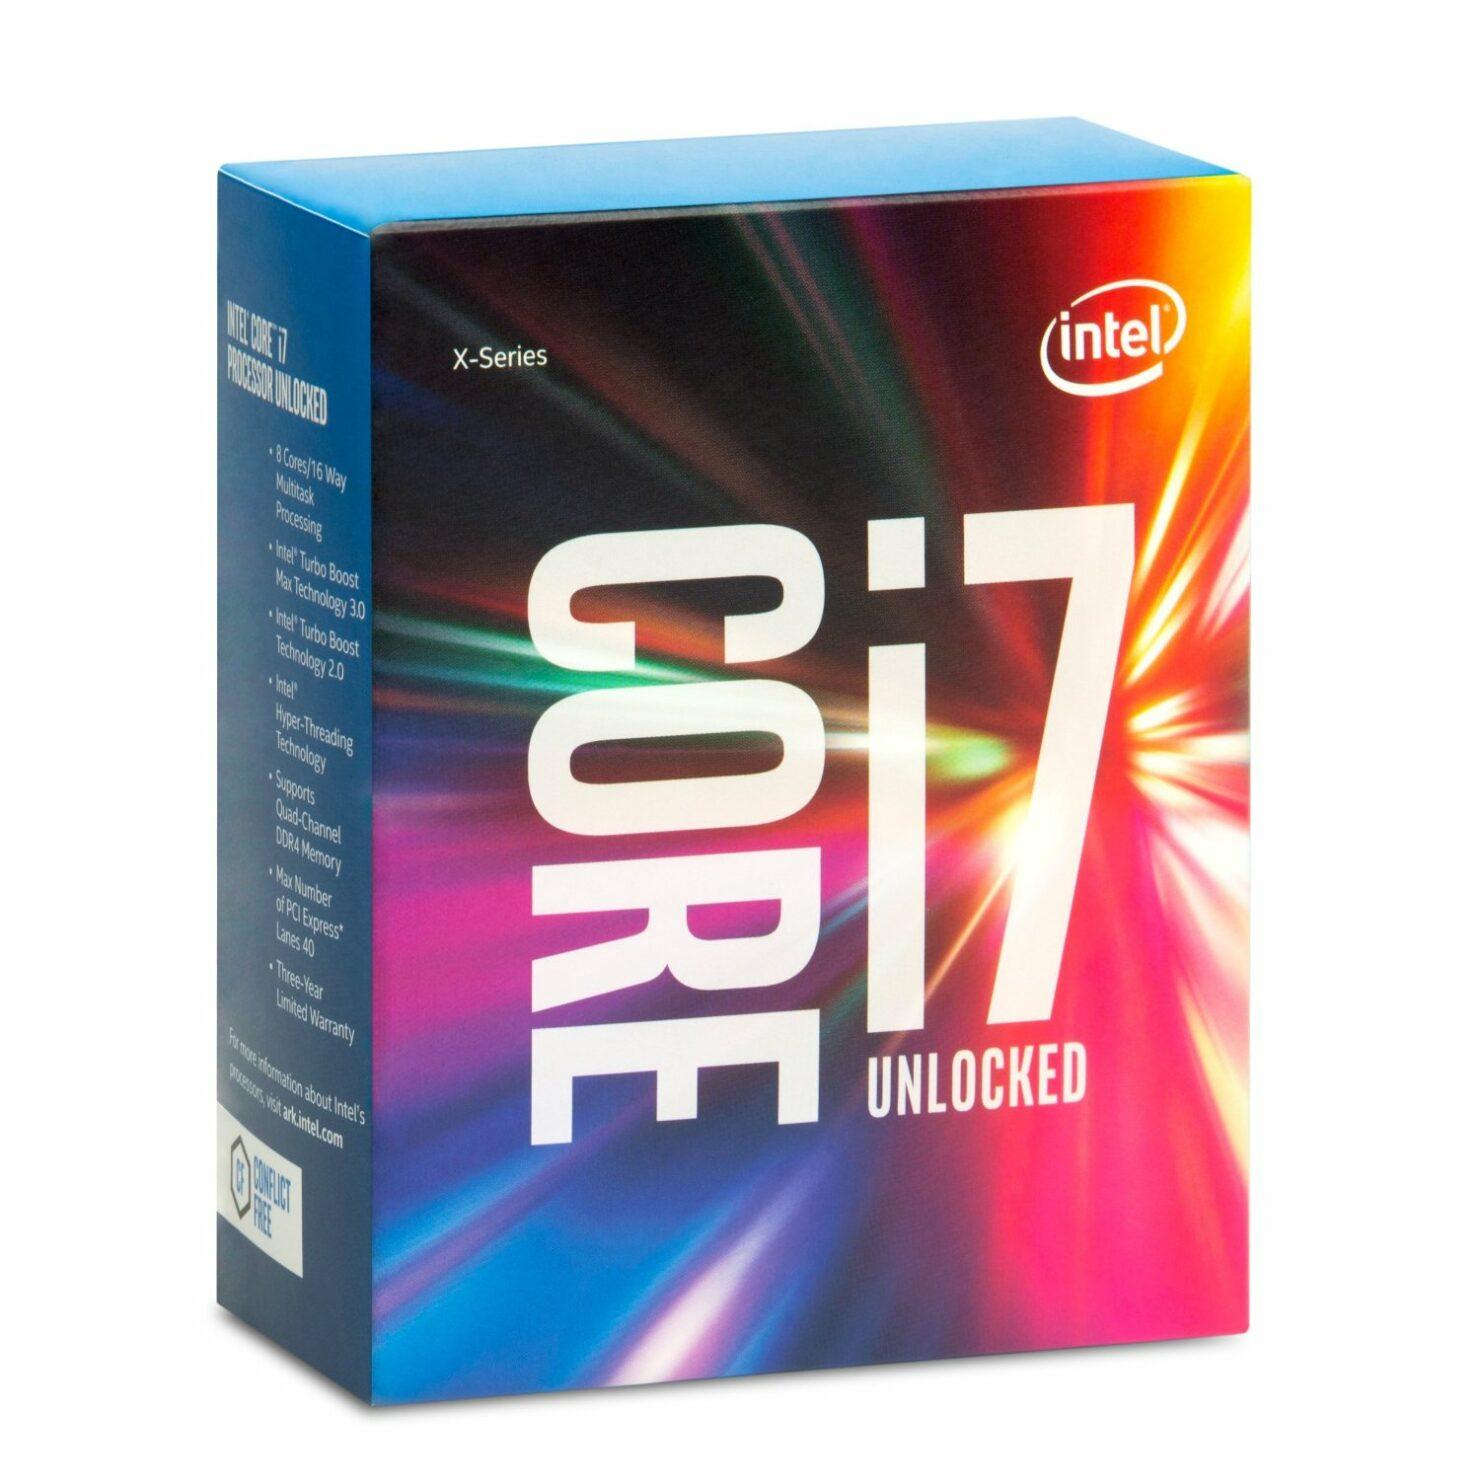 intel-broadwell-e-cpu-package_1